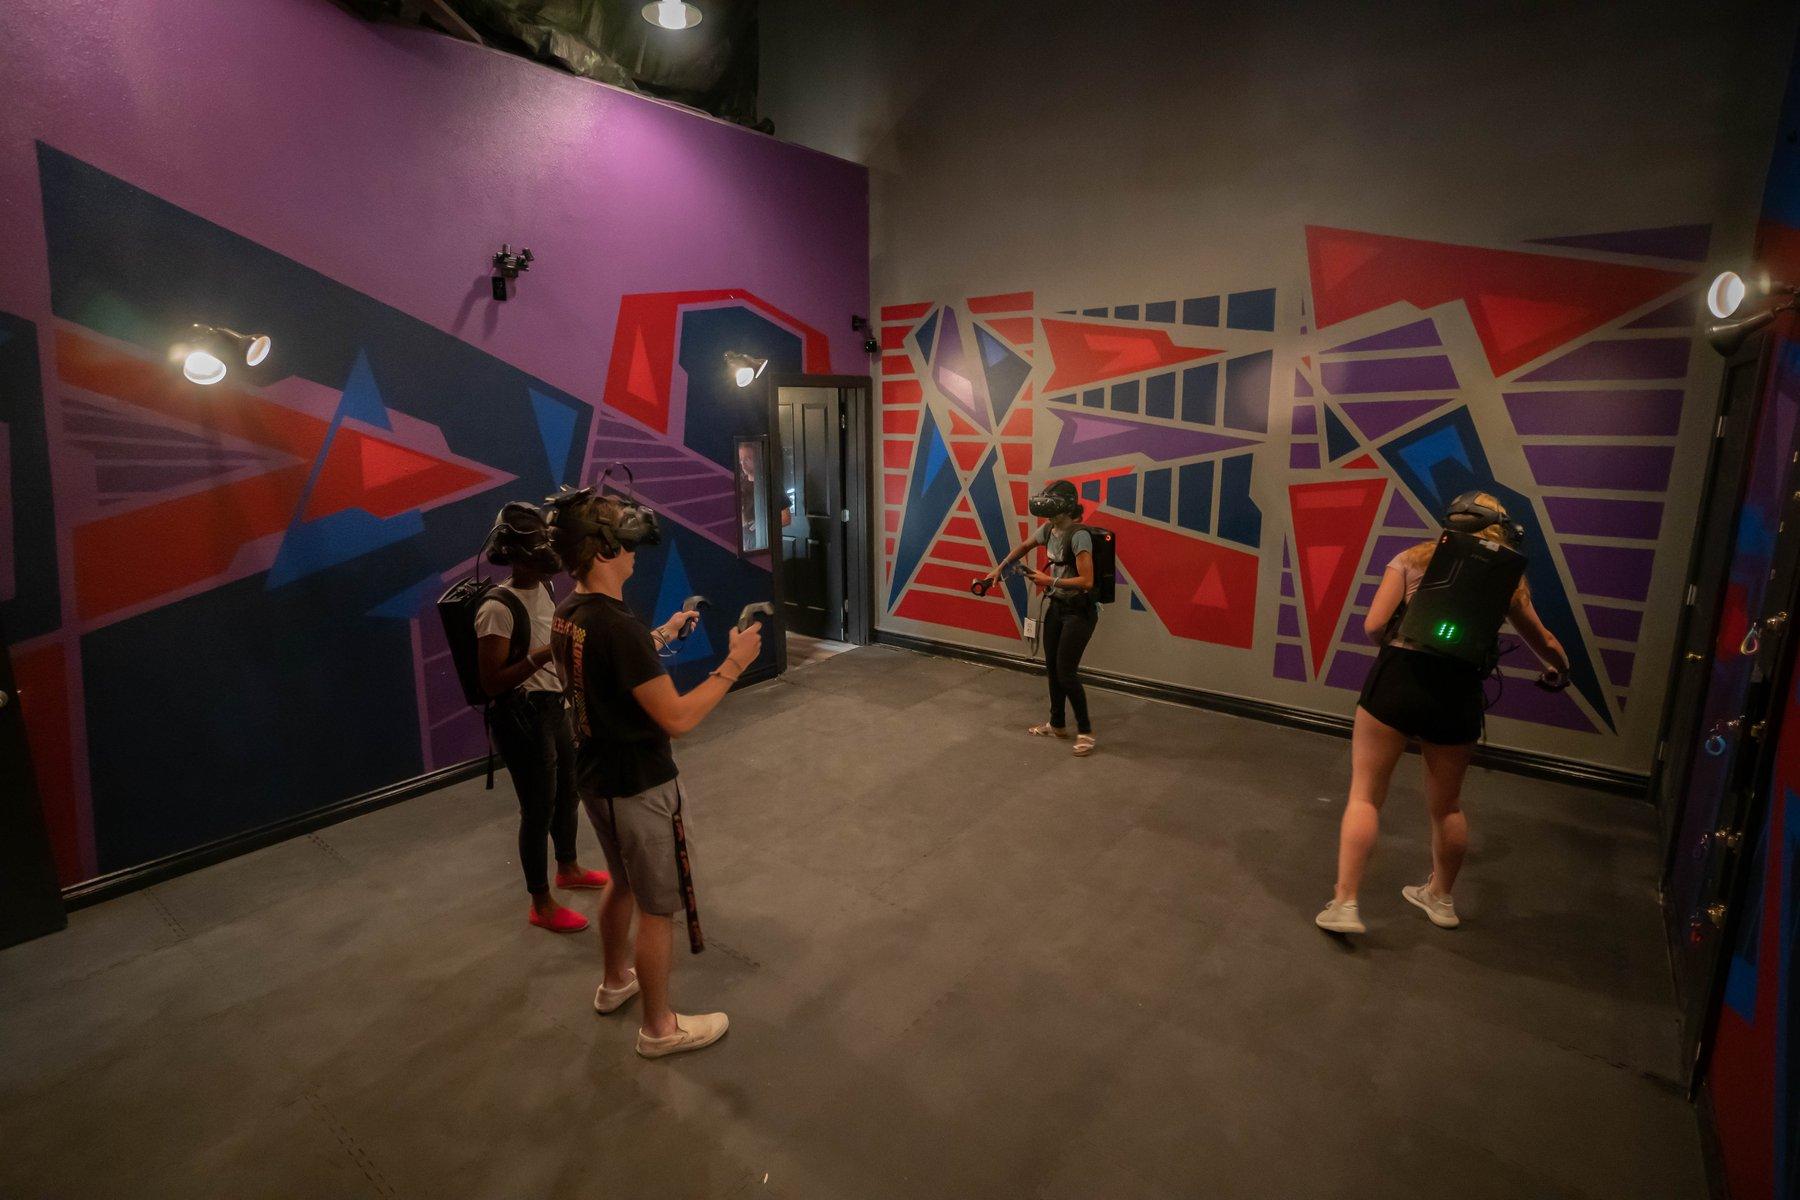 VR customers in empty room